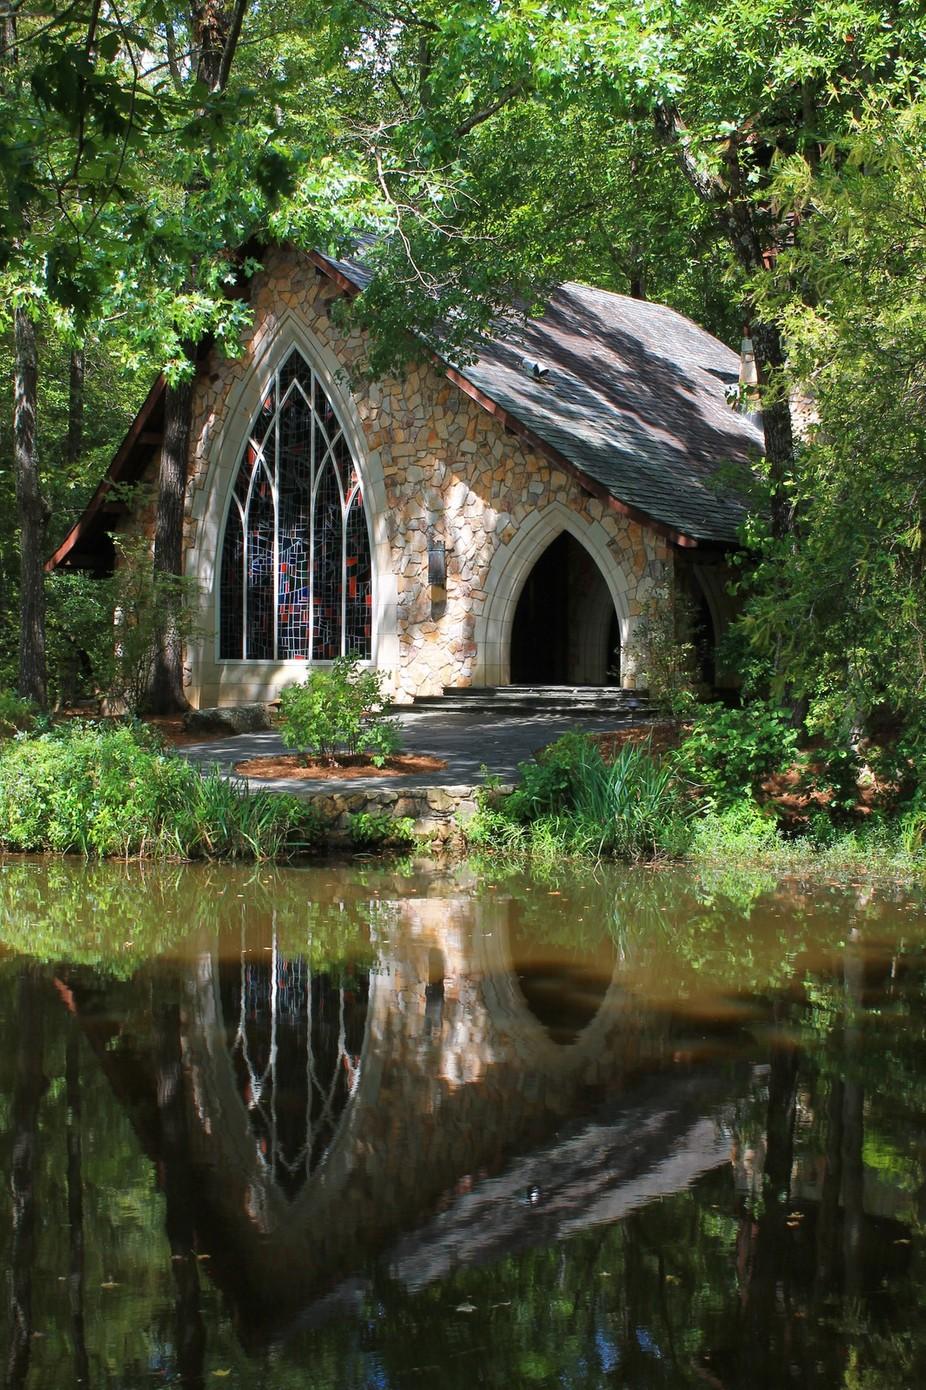 Photo taken at Callaway Gardens, Pine Mountain, Georgia.